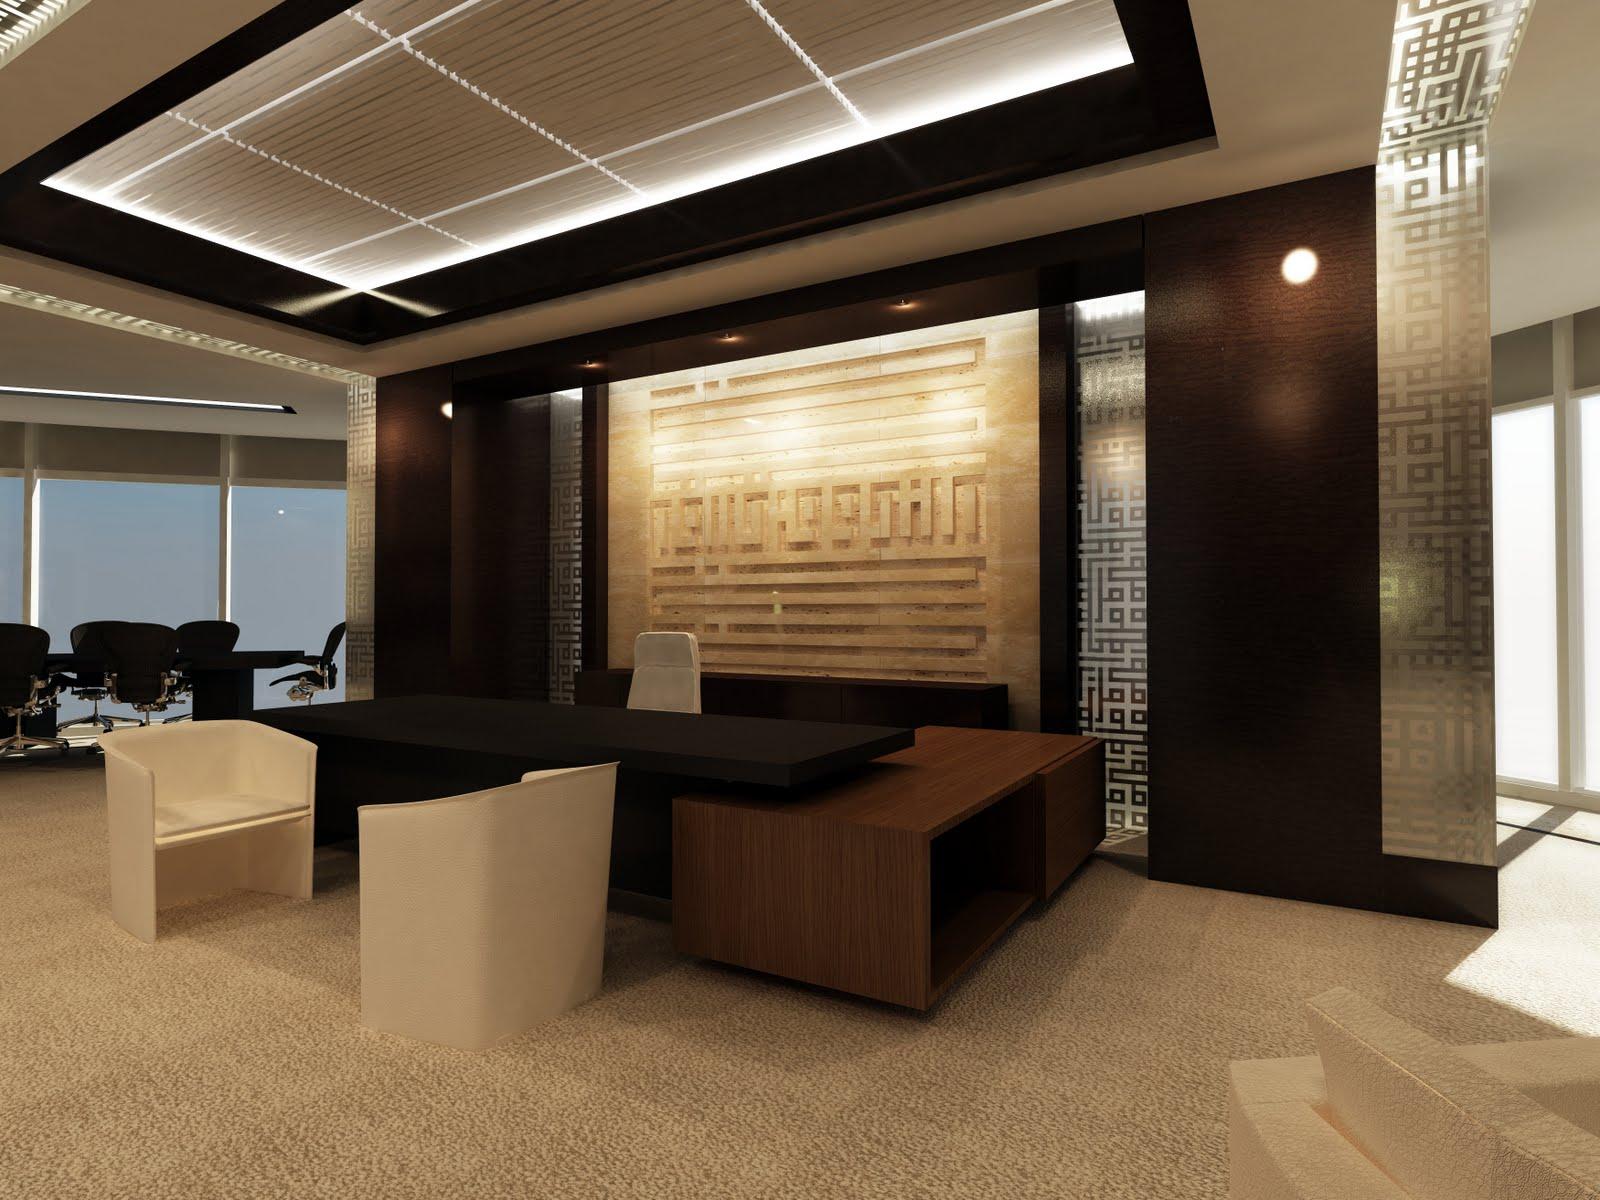 Tawazen interior design l l c khalifa fund office for 927 interior decoration l l c